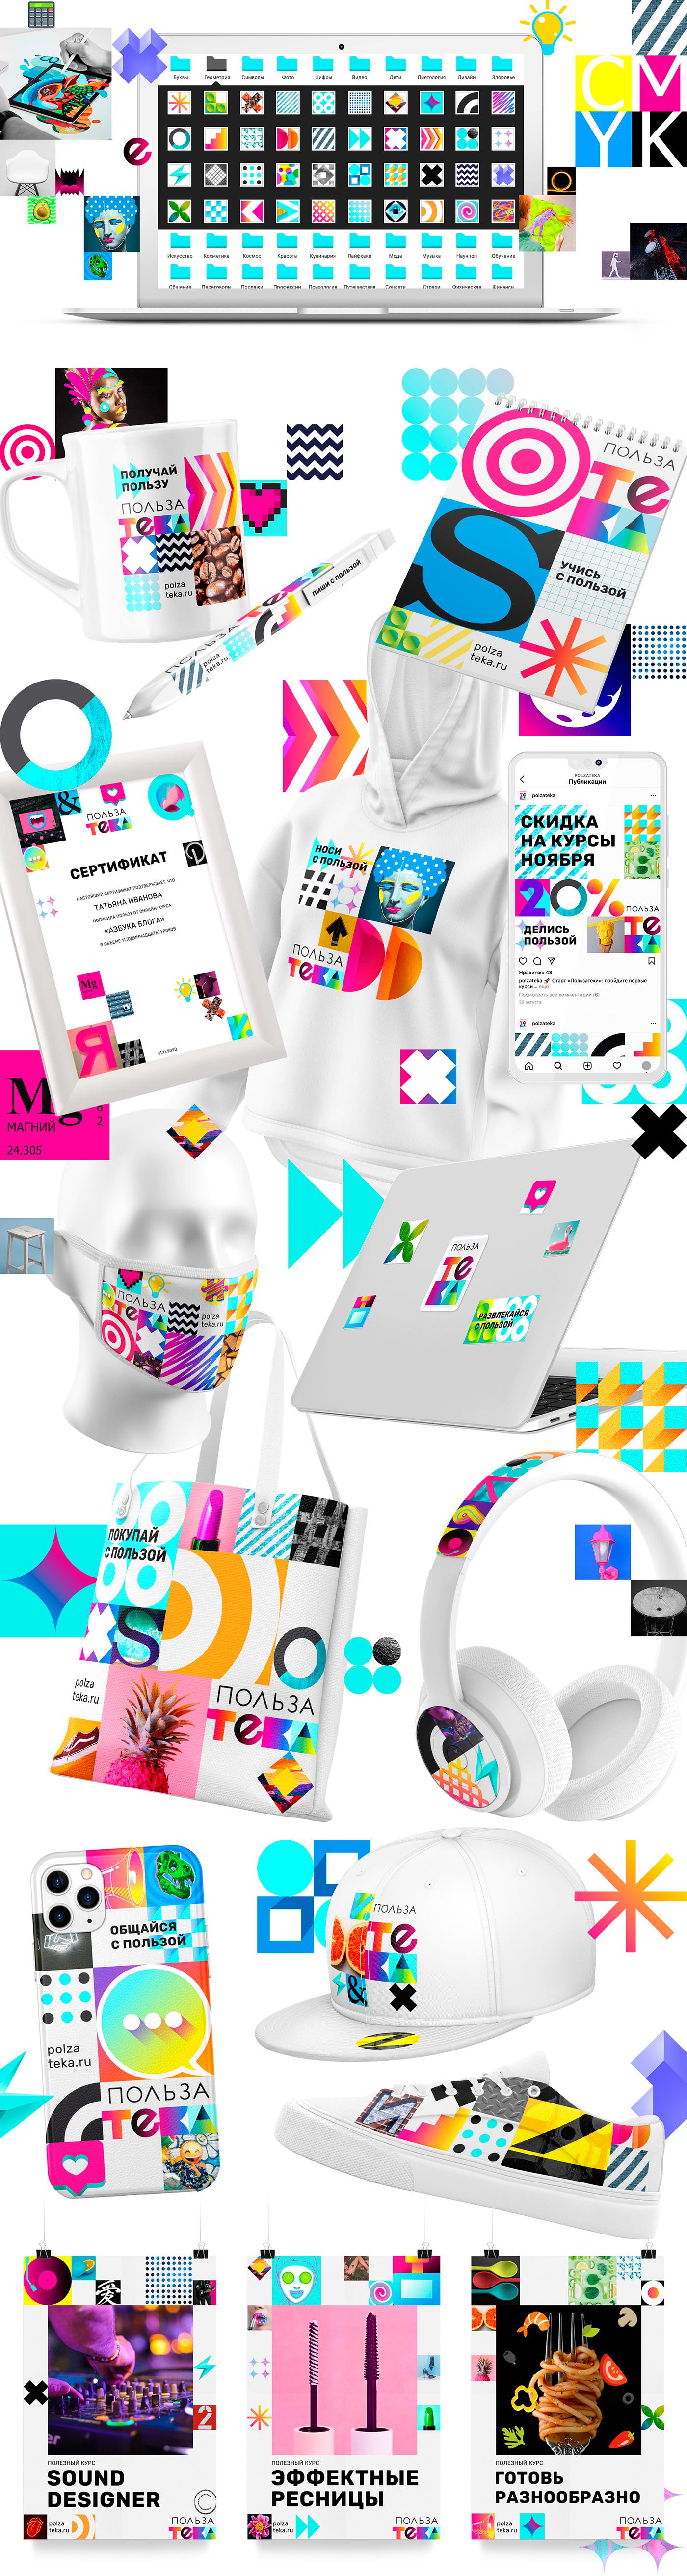 branding  clubnik graphic design  identity logo naming Online education polzateka Russia useful